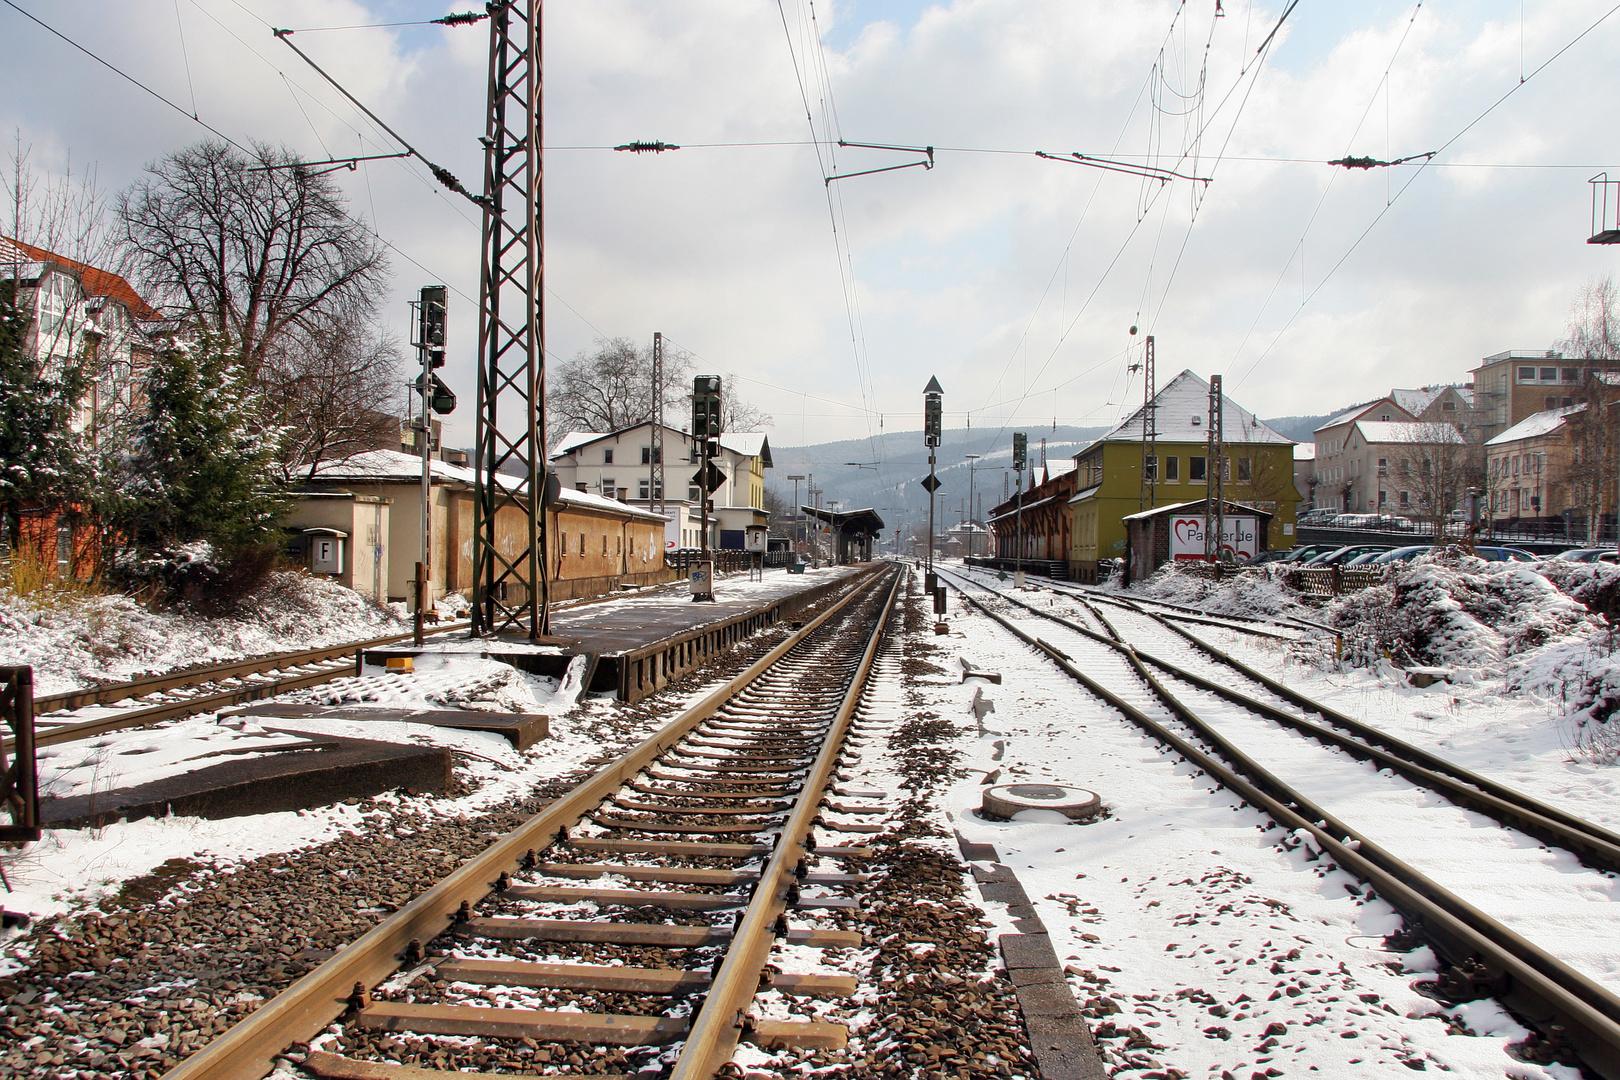 Alter Hohenlimburger Bahnhof